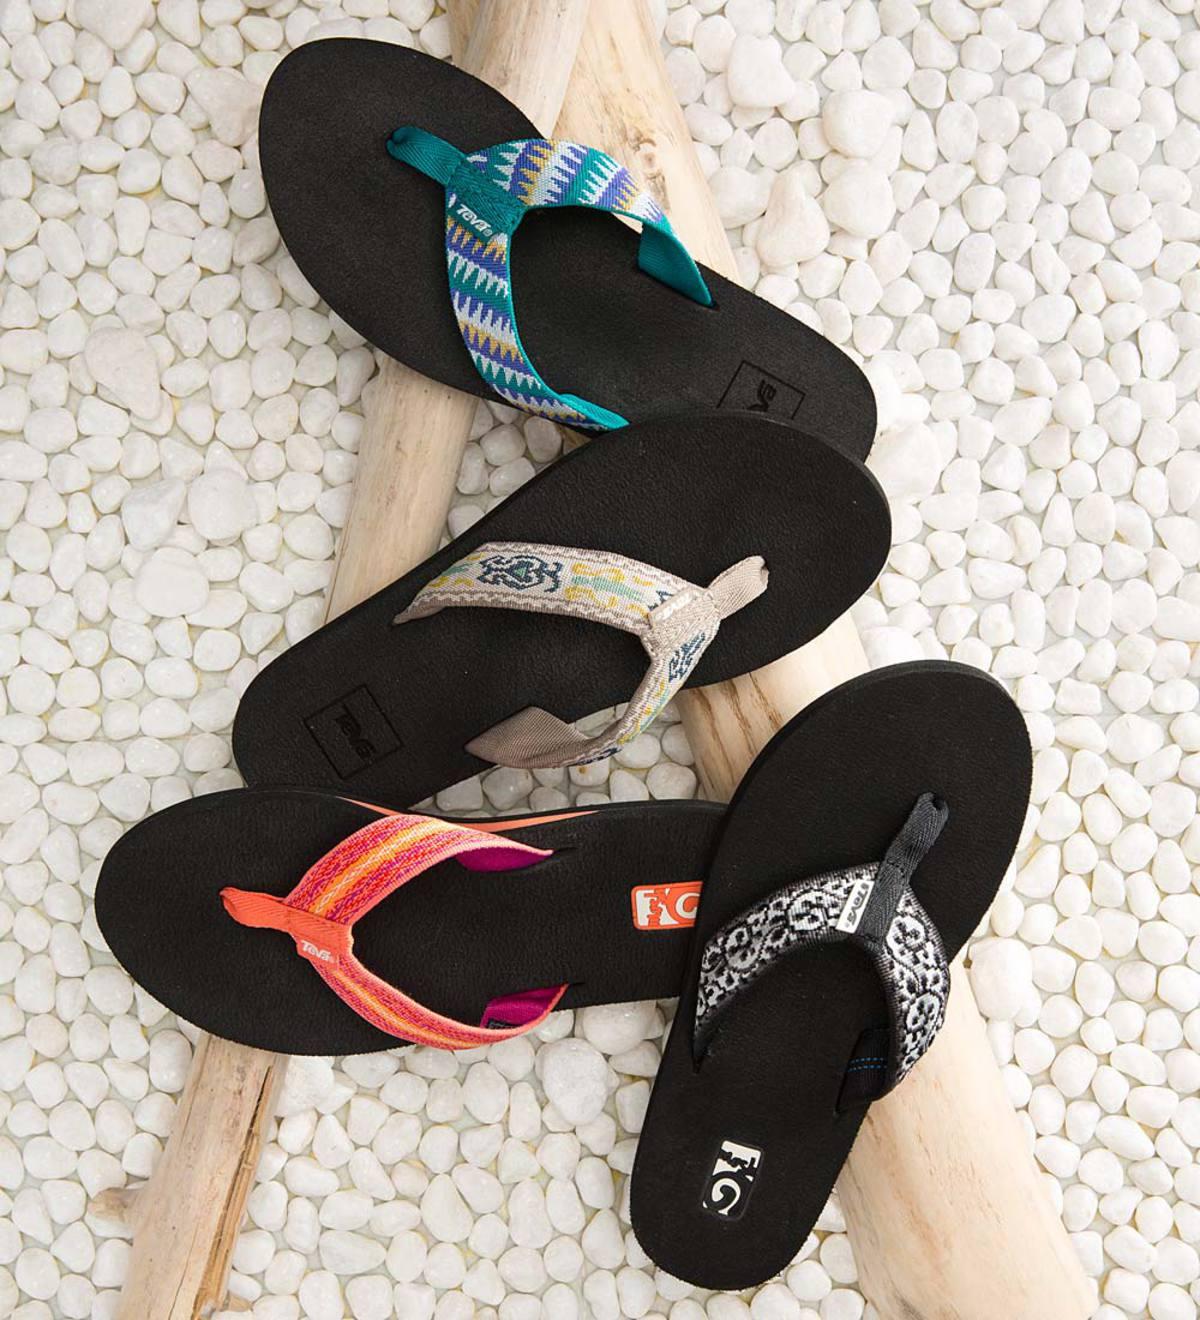 9e9eb53f5fd4 Teva Mush II Flip Flop Sandals